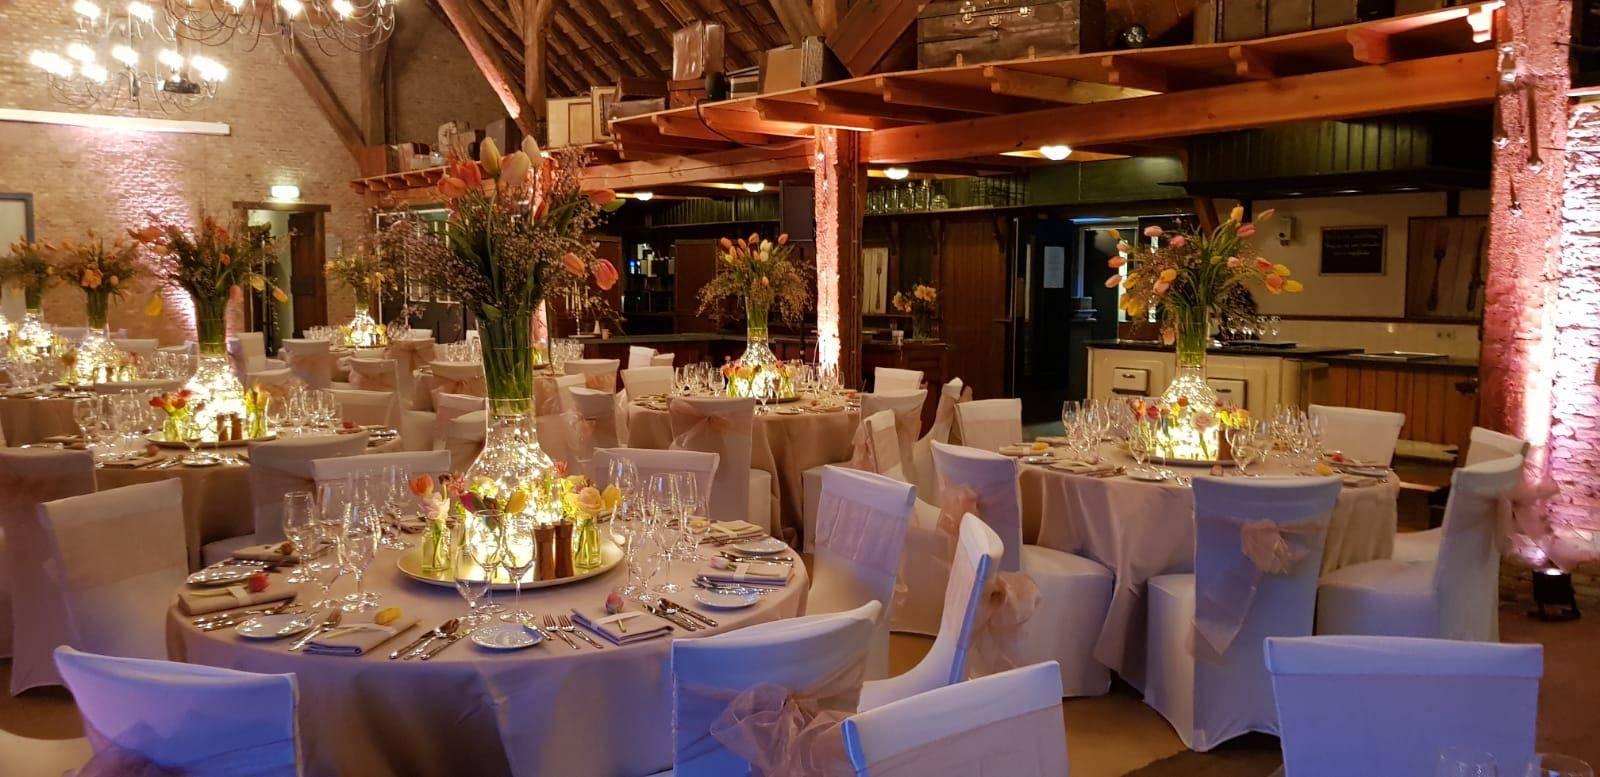 Wolterinck Event Decoration - Verhuur & Decoratie - House of Events - 51